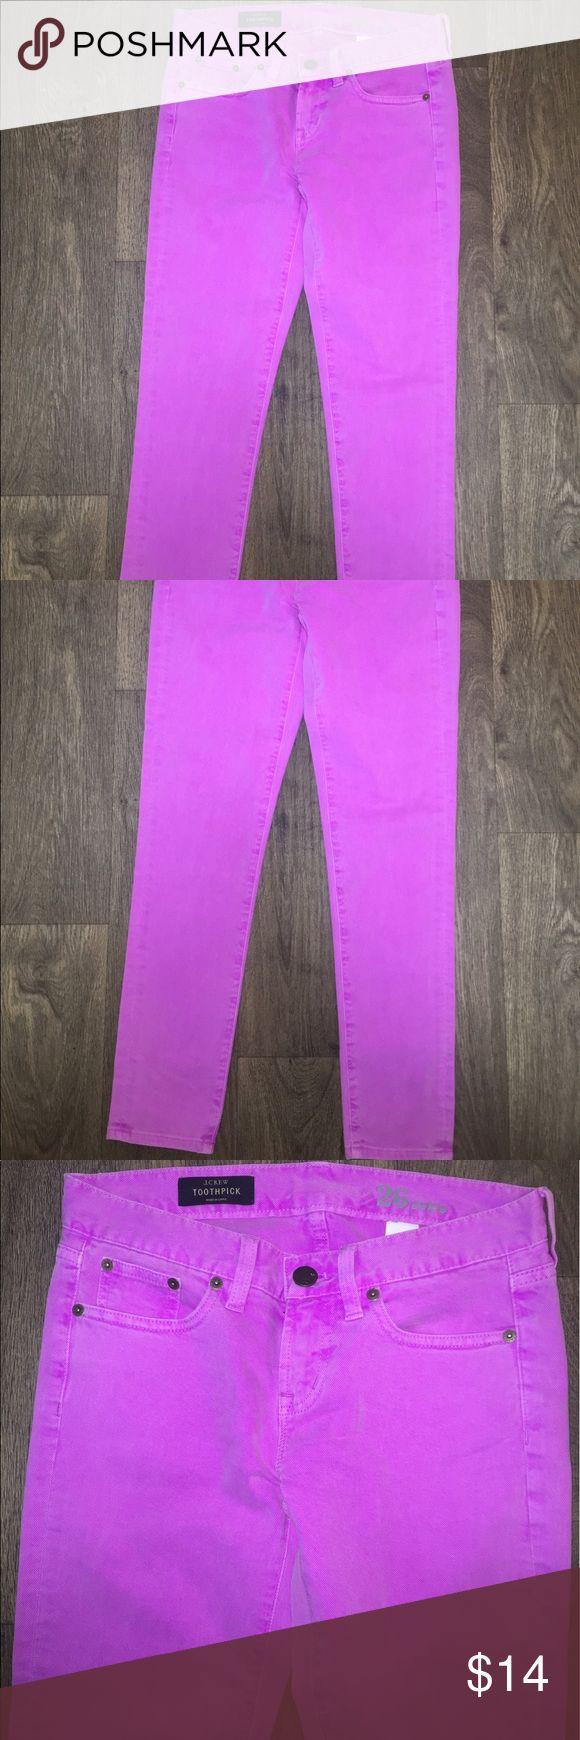 Women's J. Crew Toothpick lavender  Jeans Size 26 Women's J. Crew Toothpick Purple/ Lavender Skinny Jeans Size 26 Ankle. J. Crew Pants Skinny